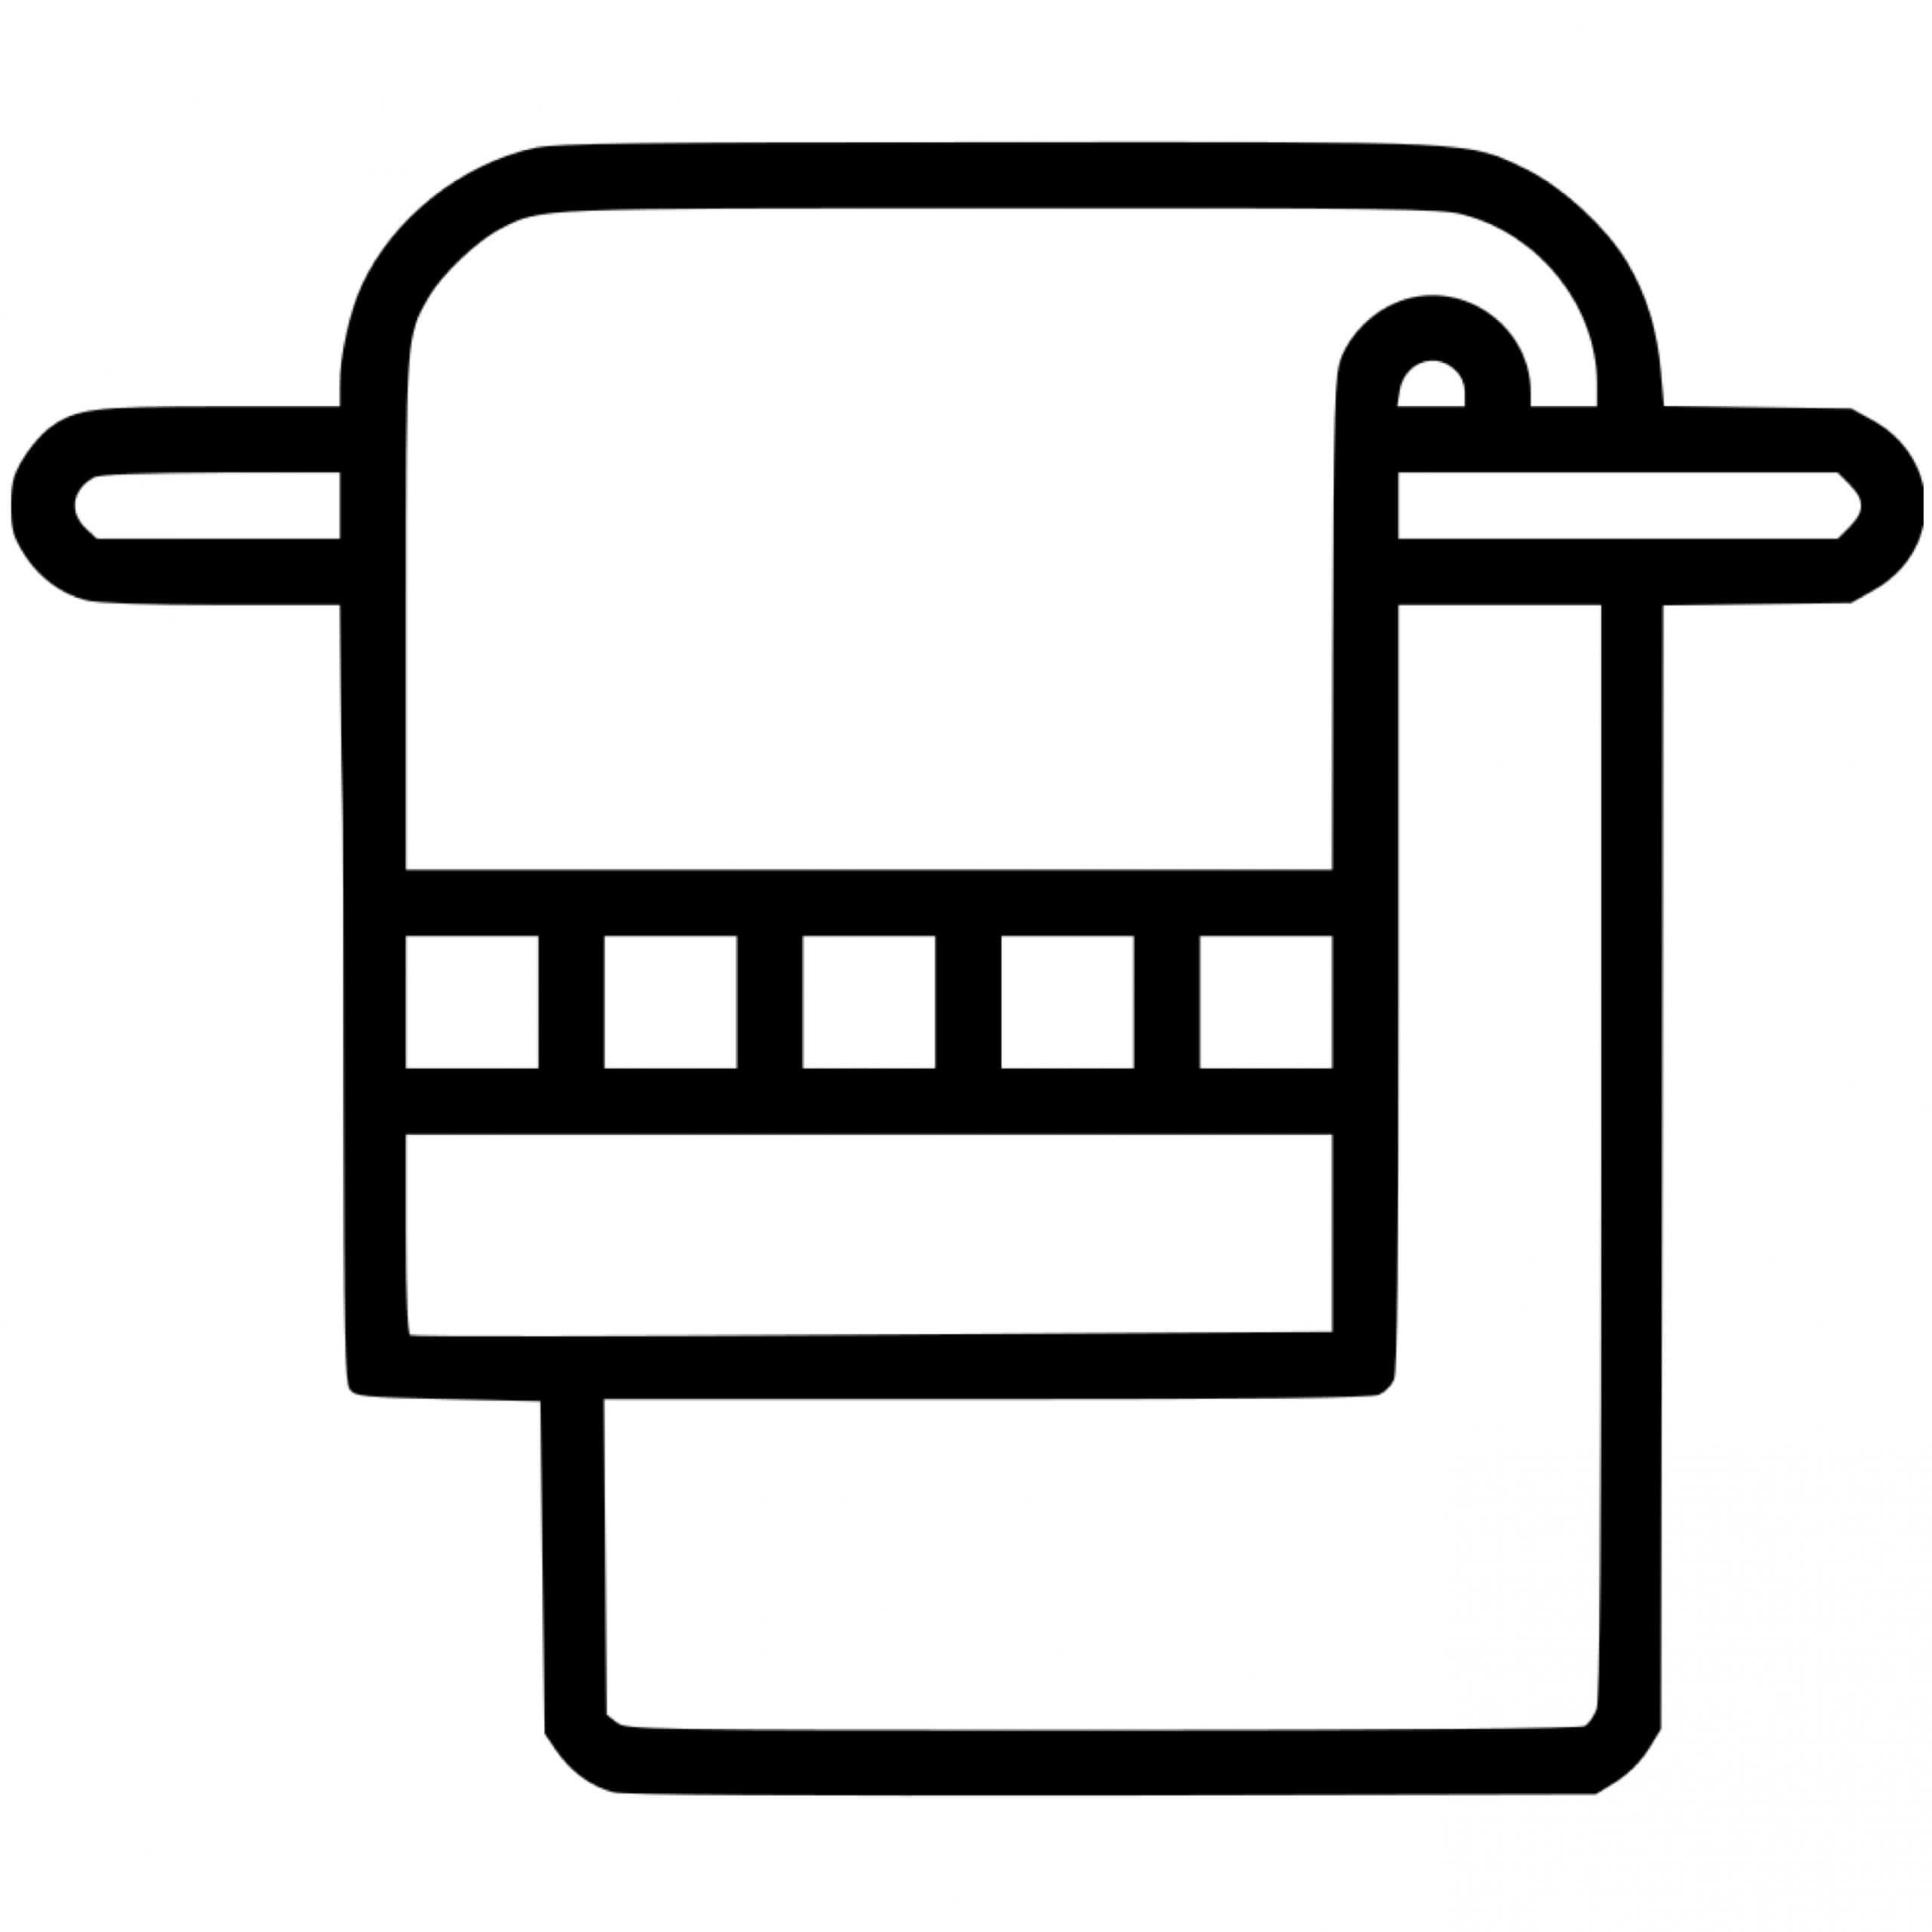 handtuch symbol scaled